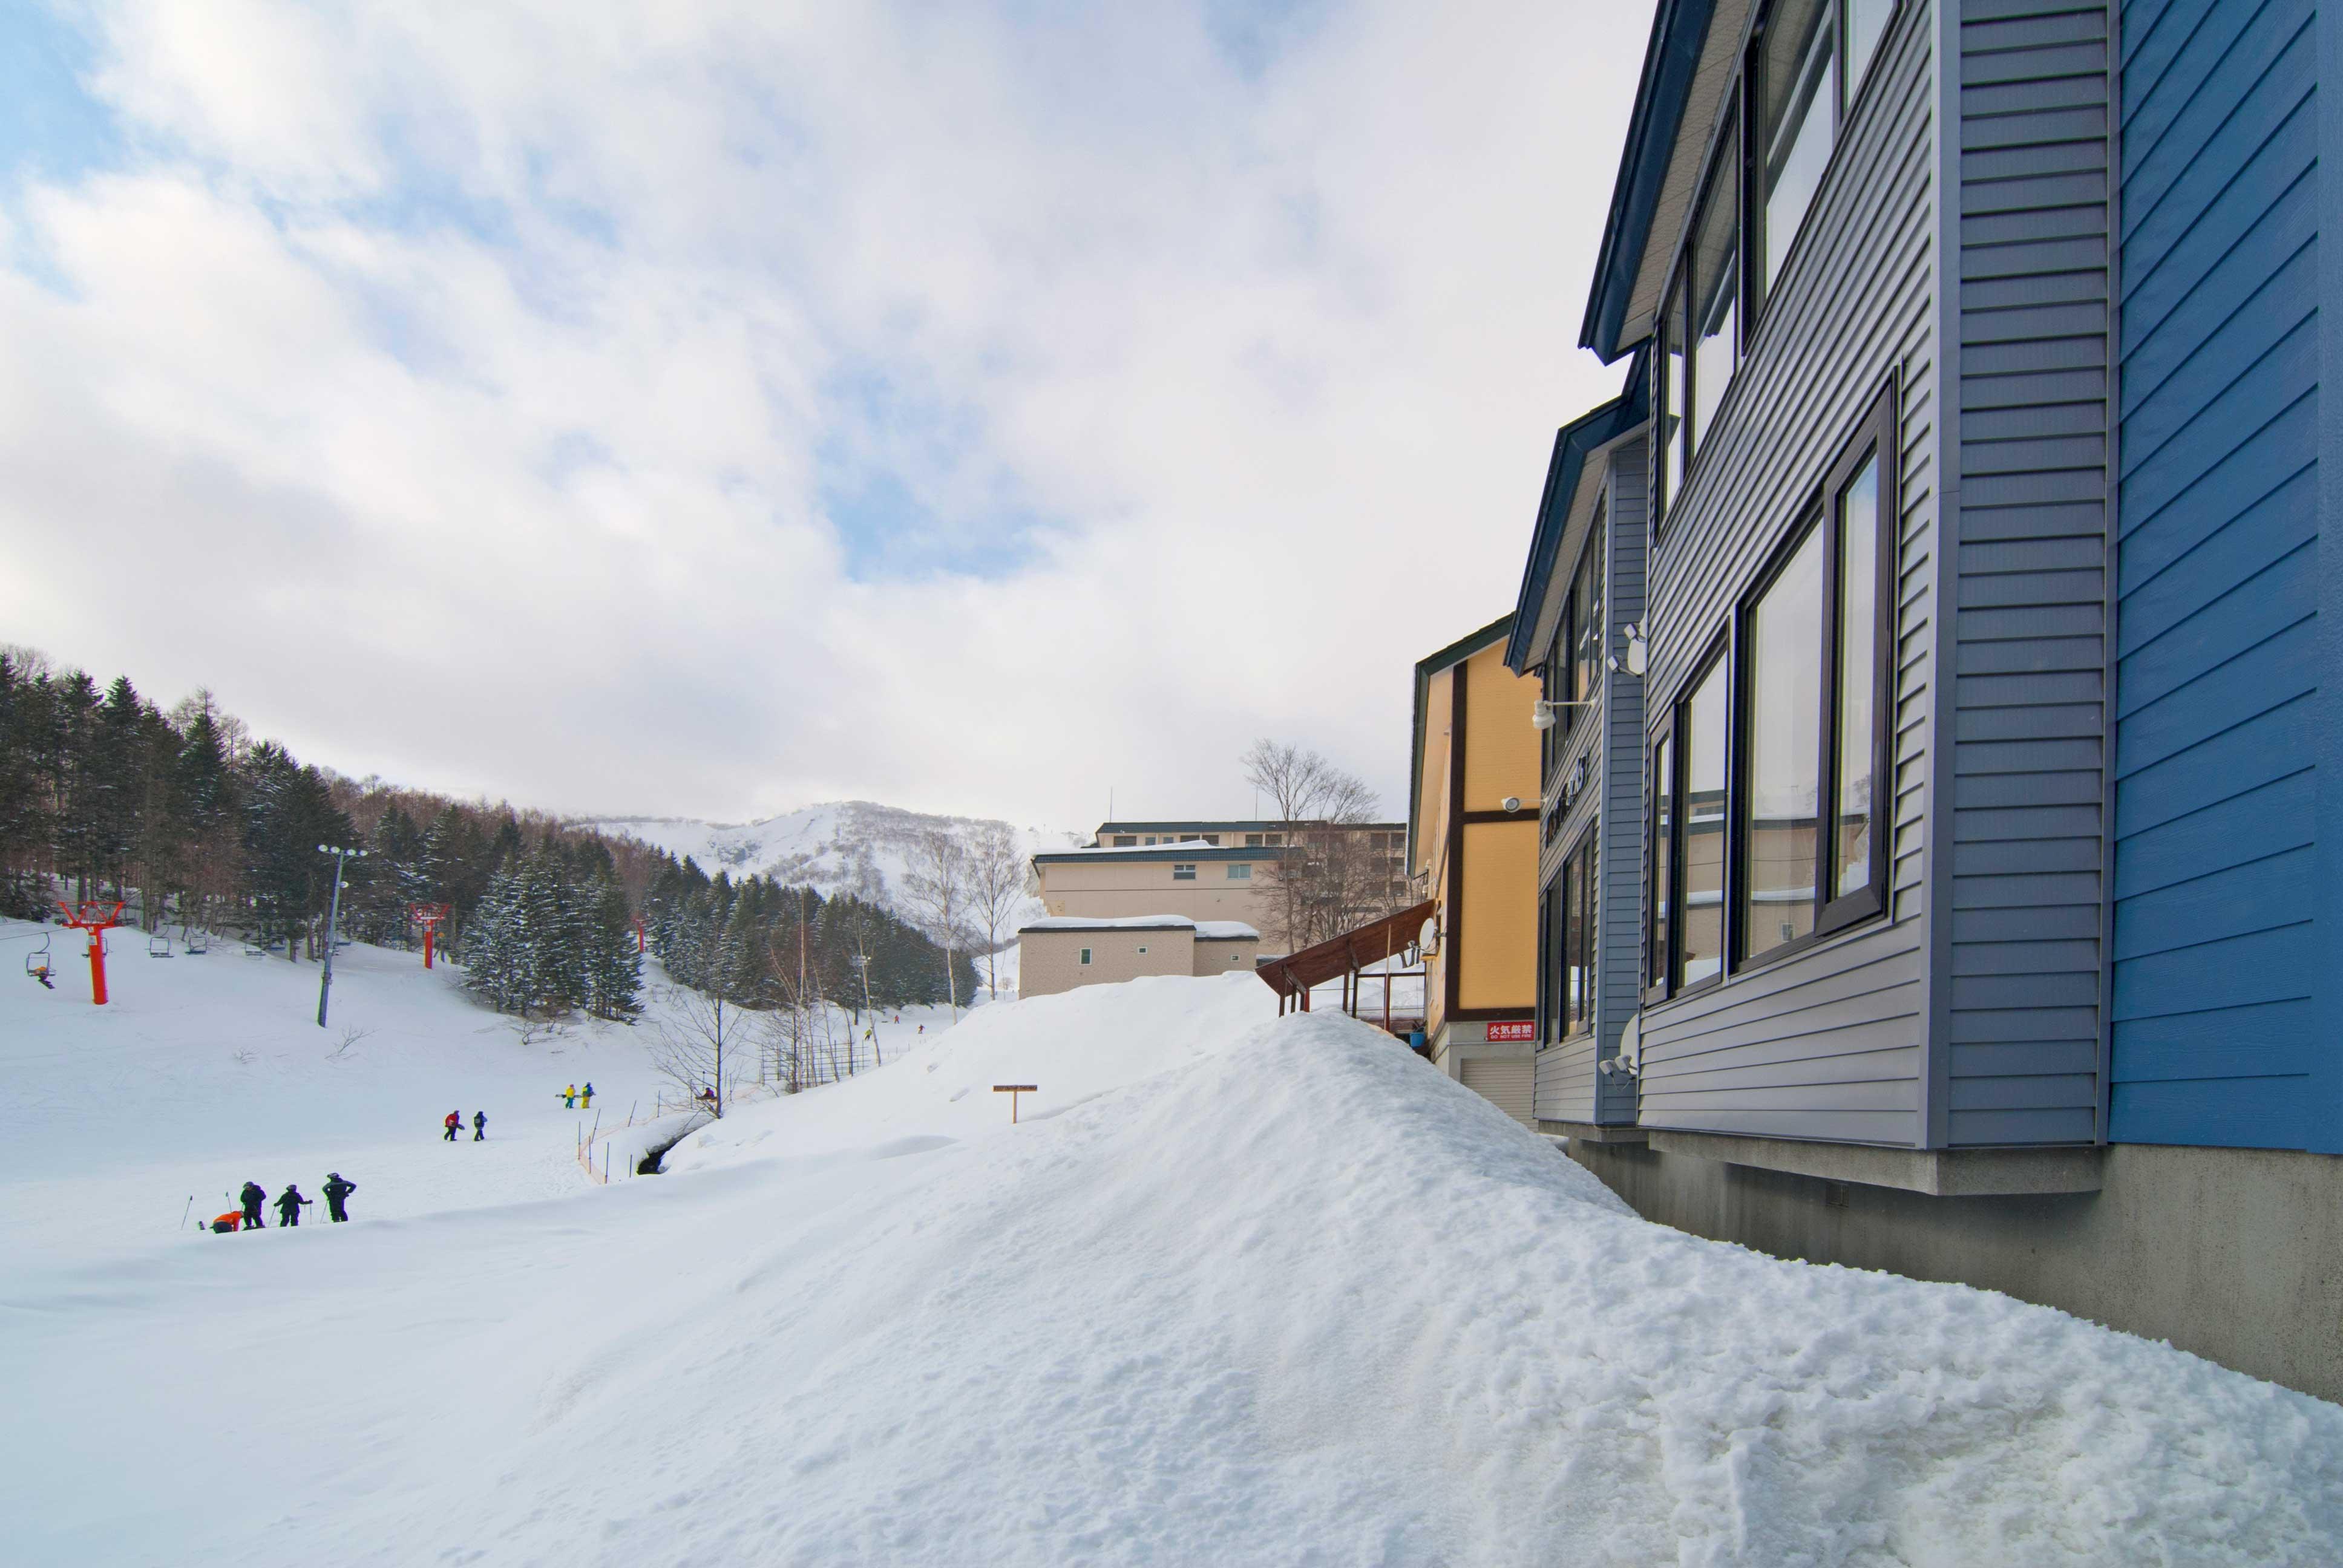 First Tracks Slopeside View | Upper Hirafu